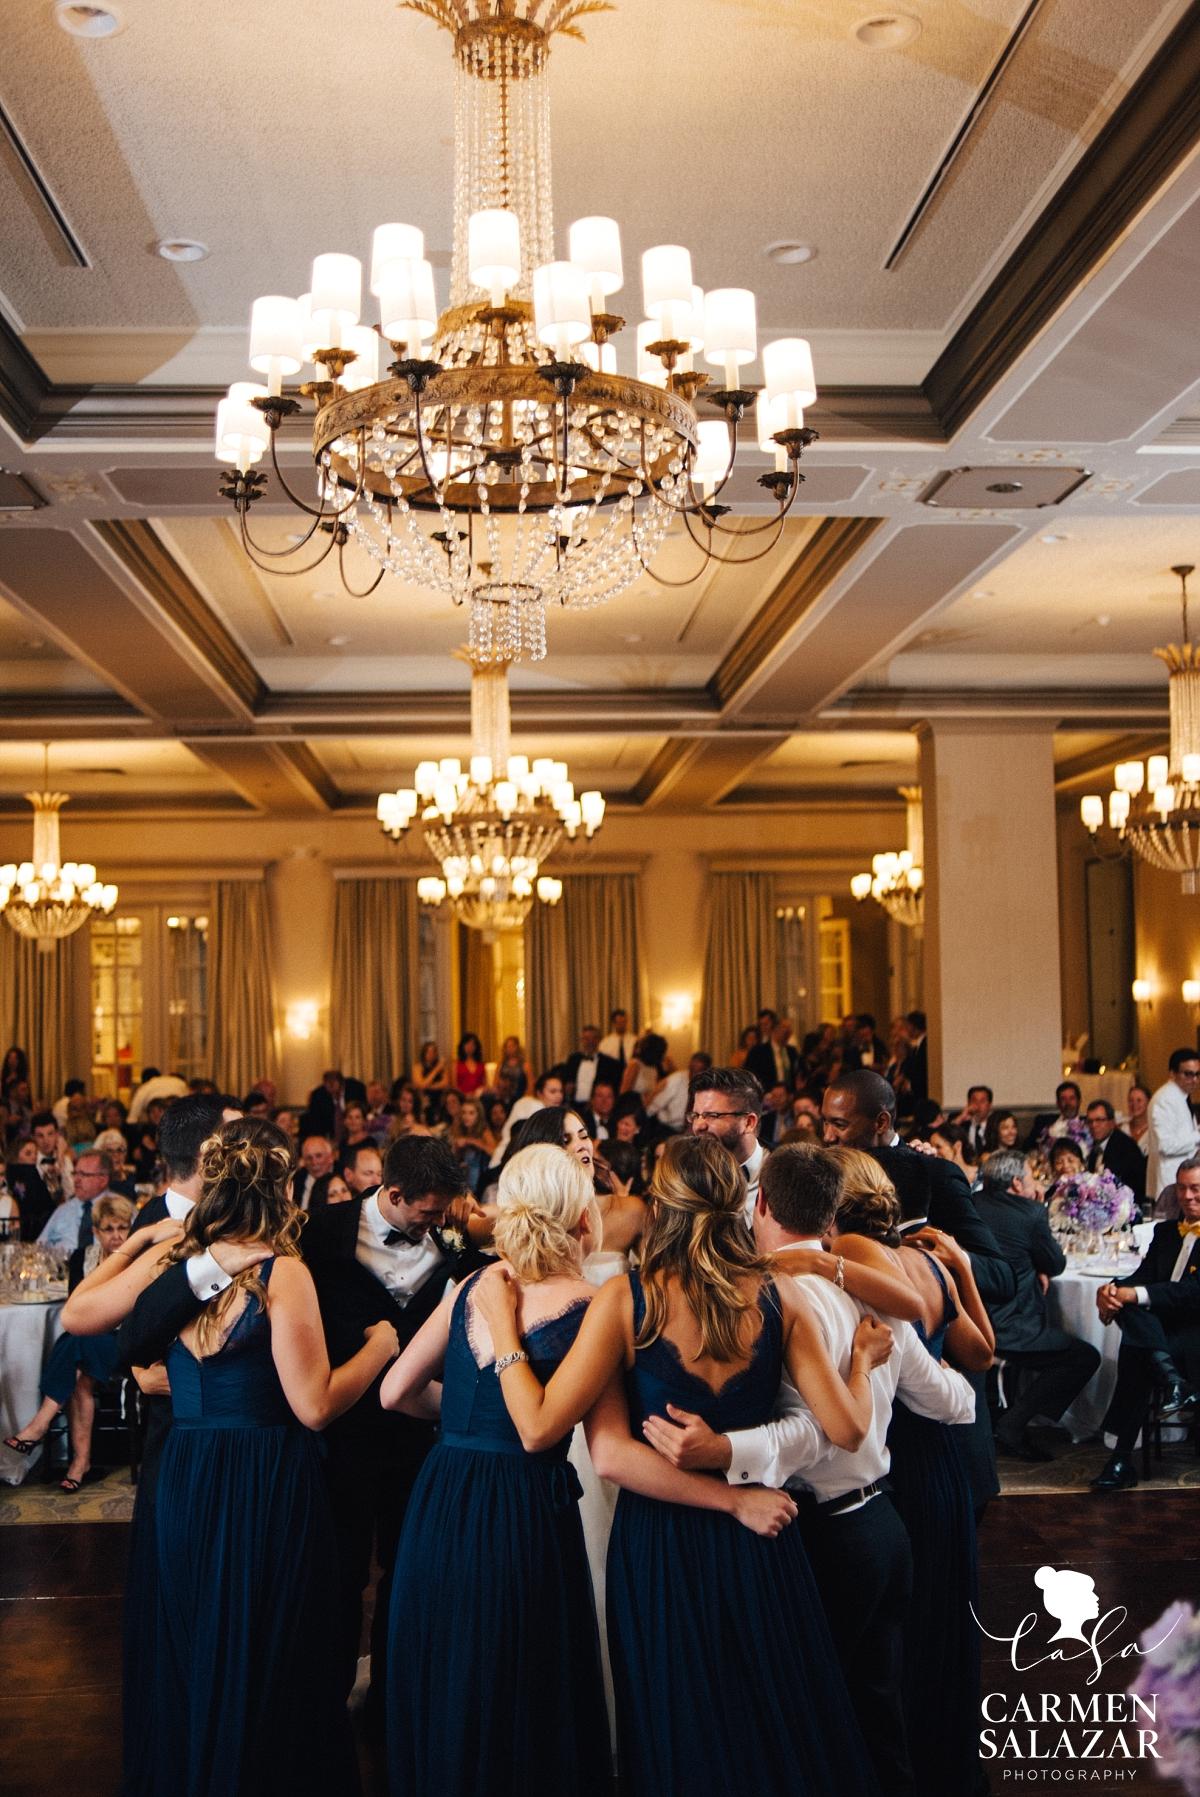 Bridal party joins first dance - Carmen Salazar